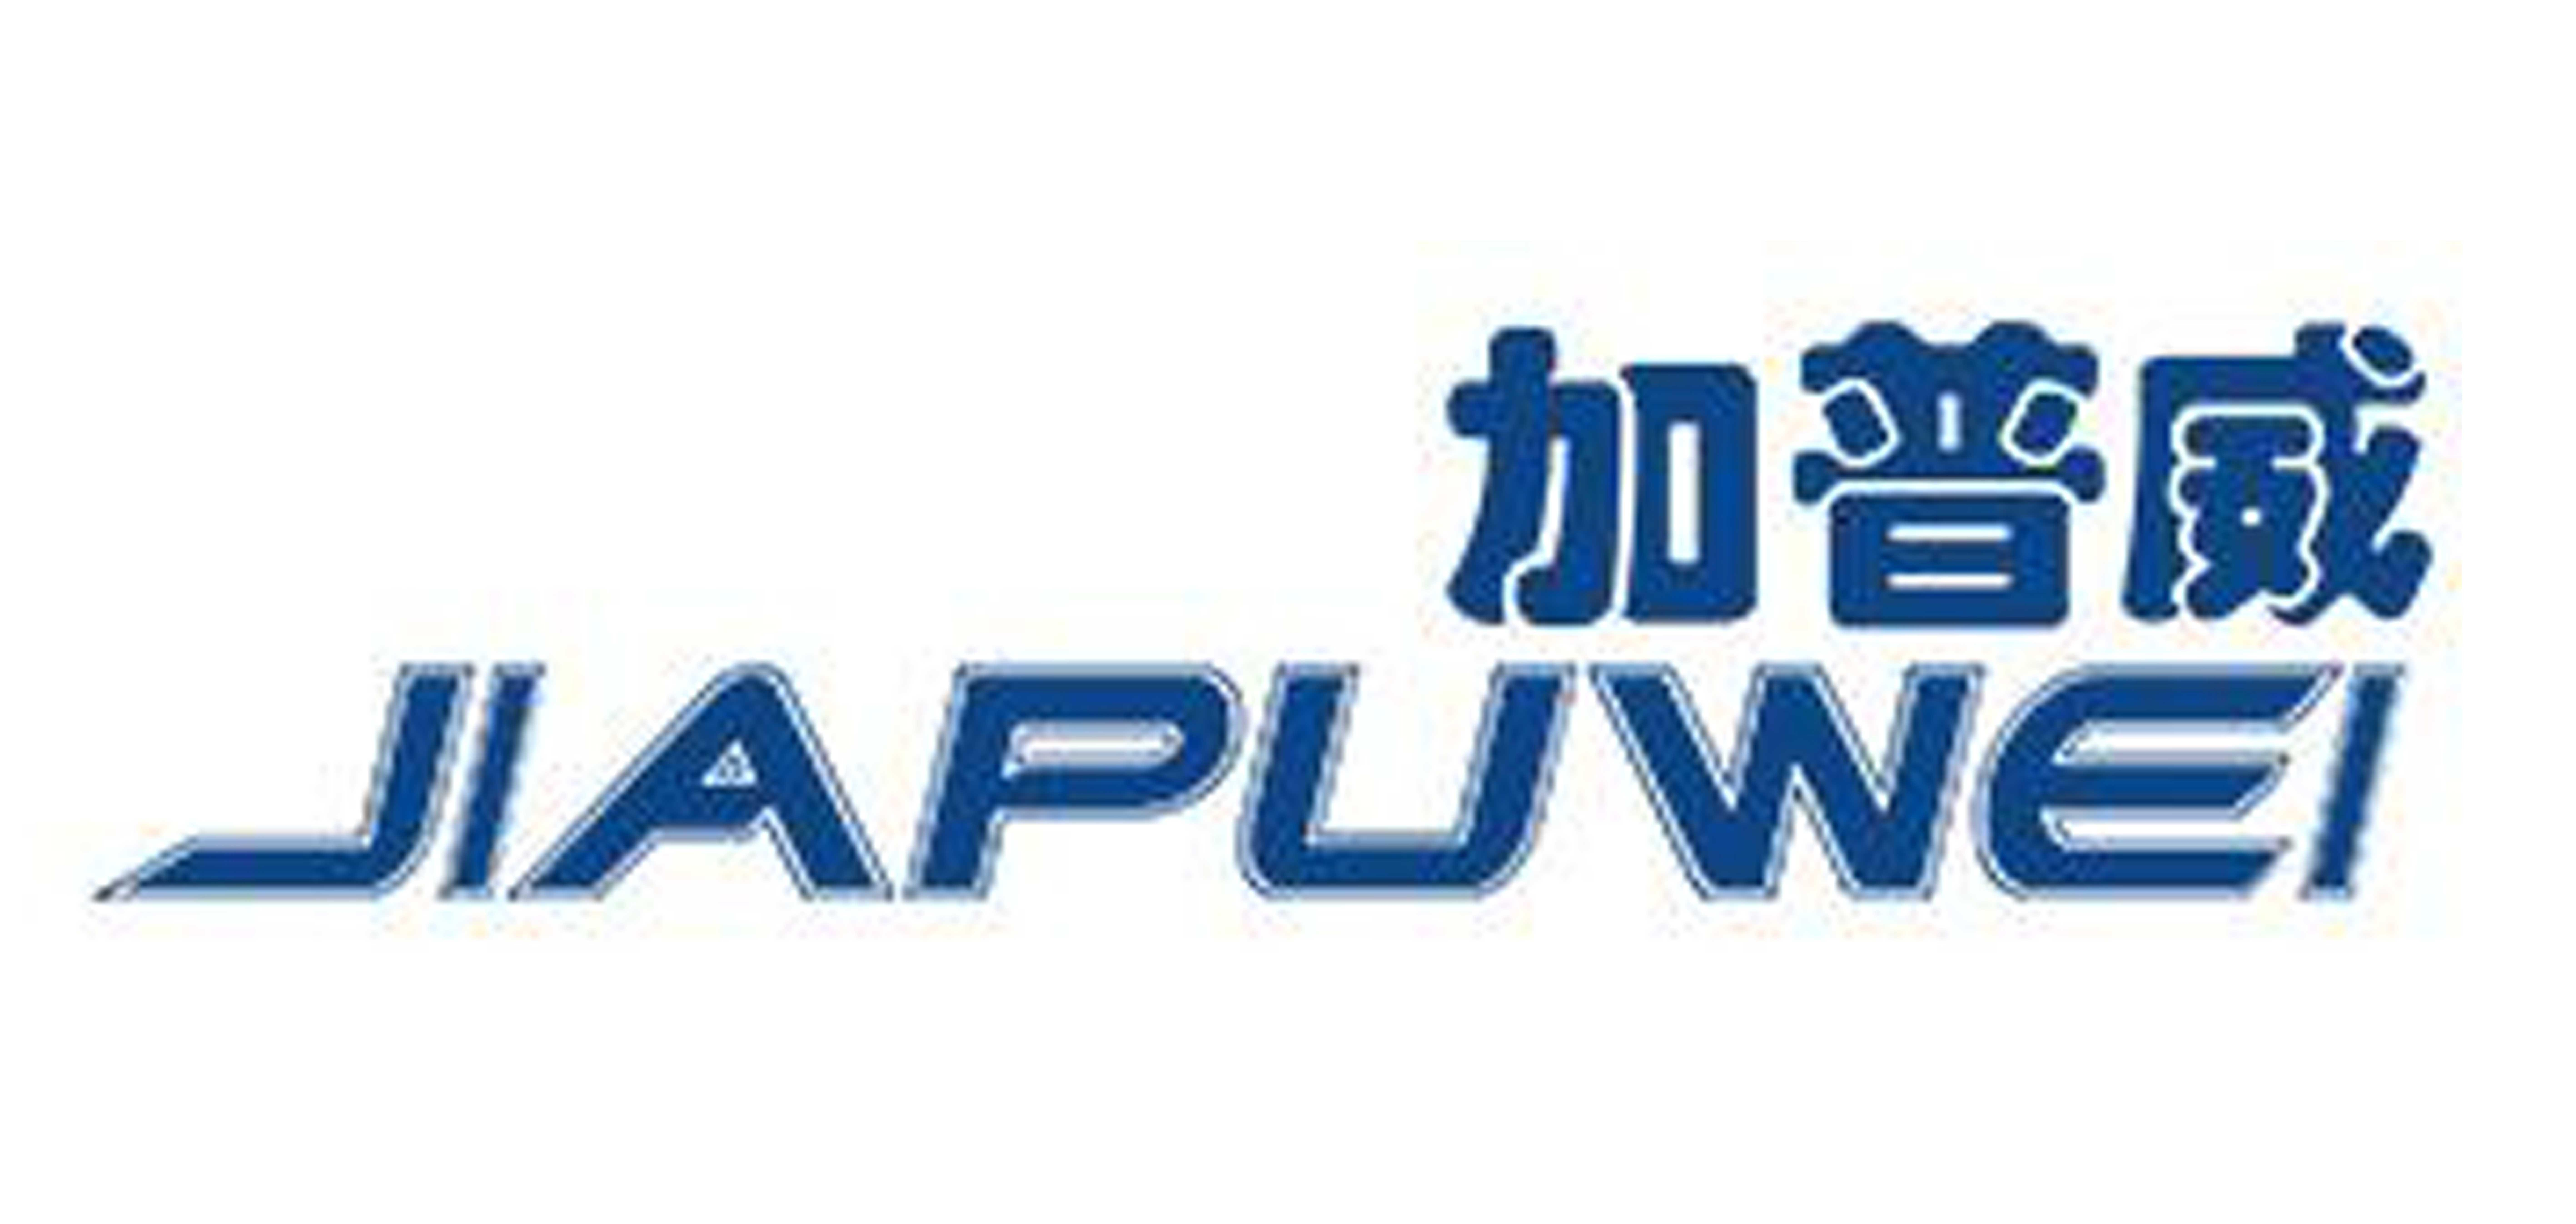 JIAPUWEI是什么牌子_加普威品牌怎么样?